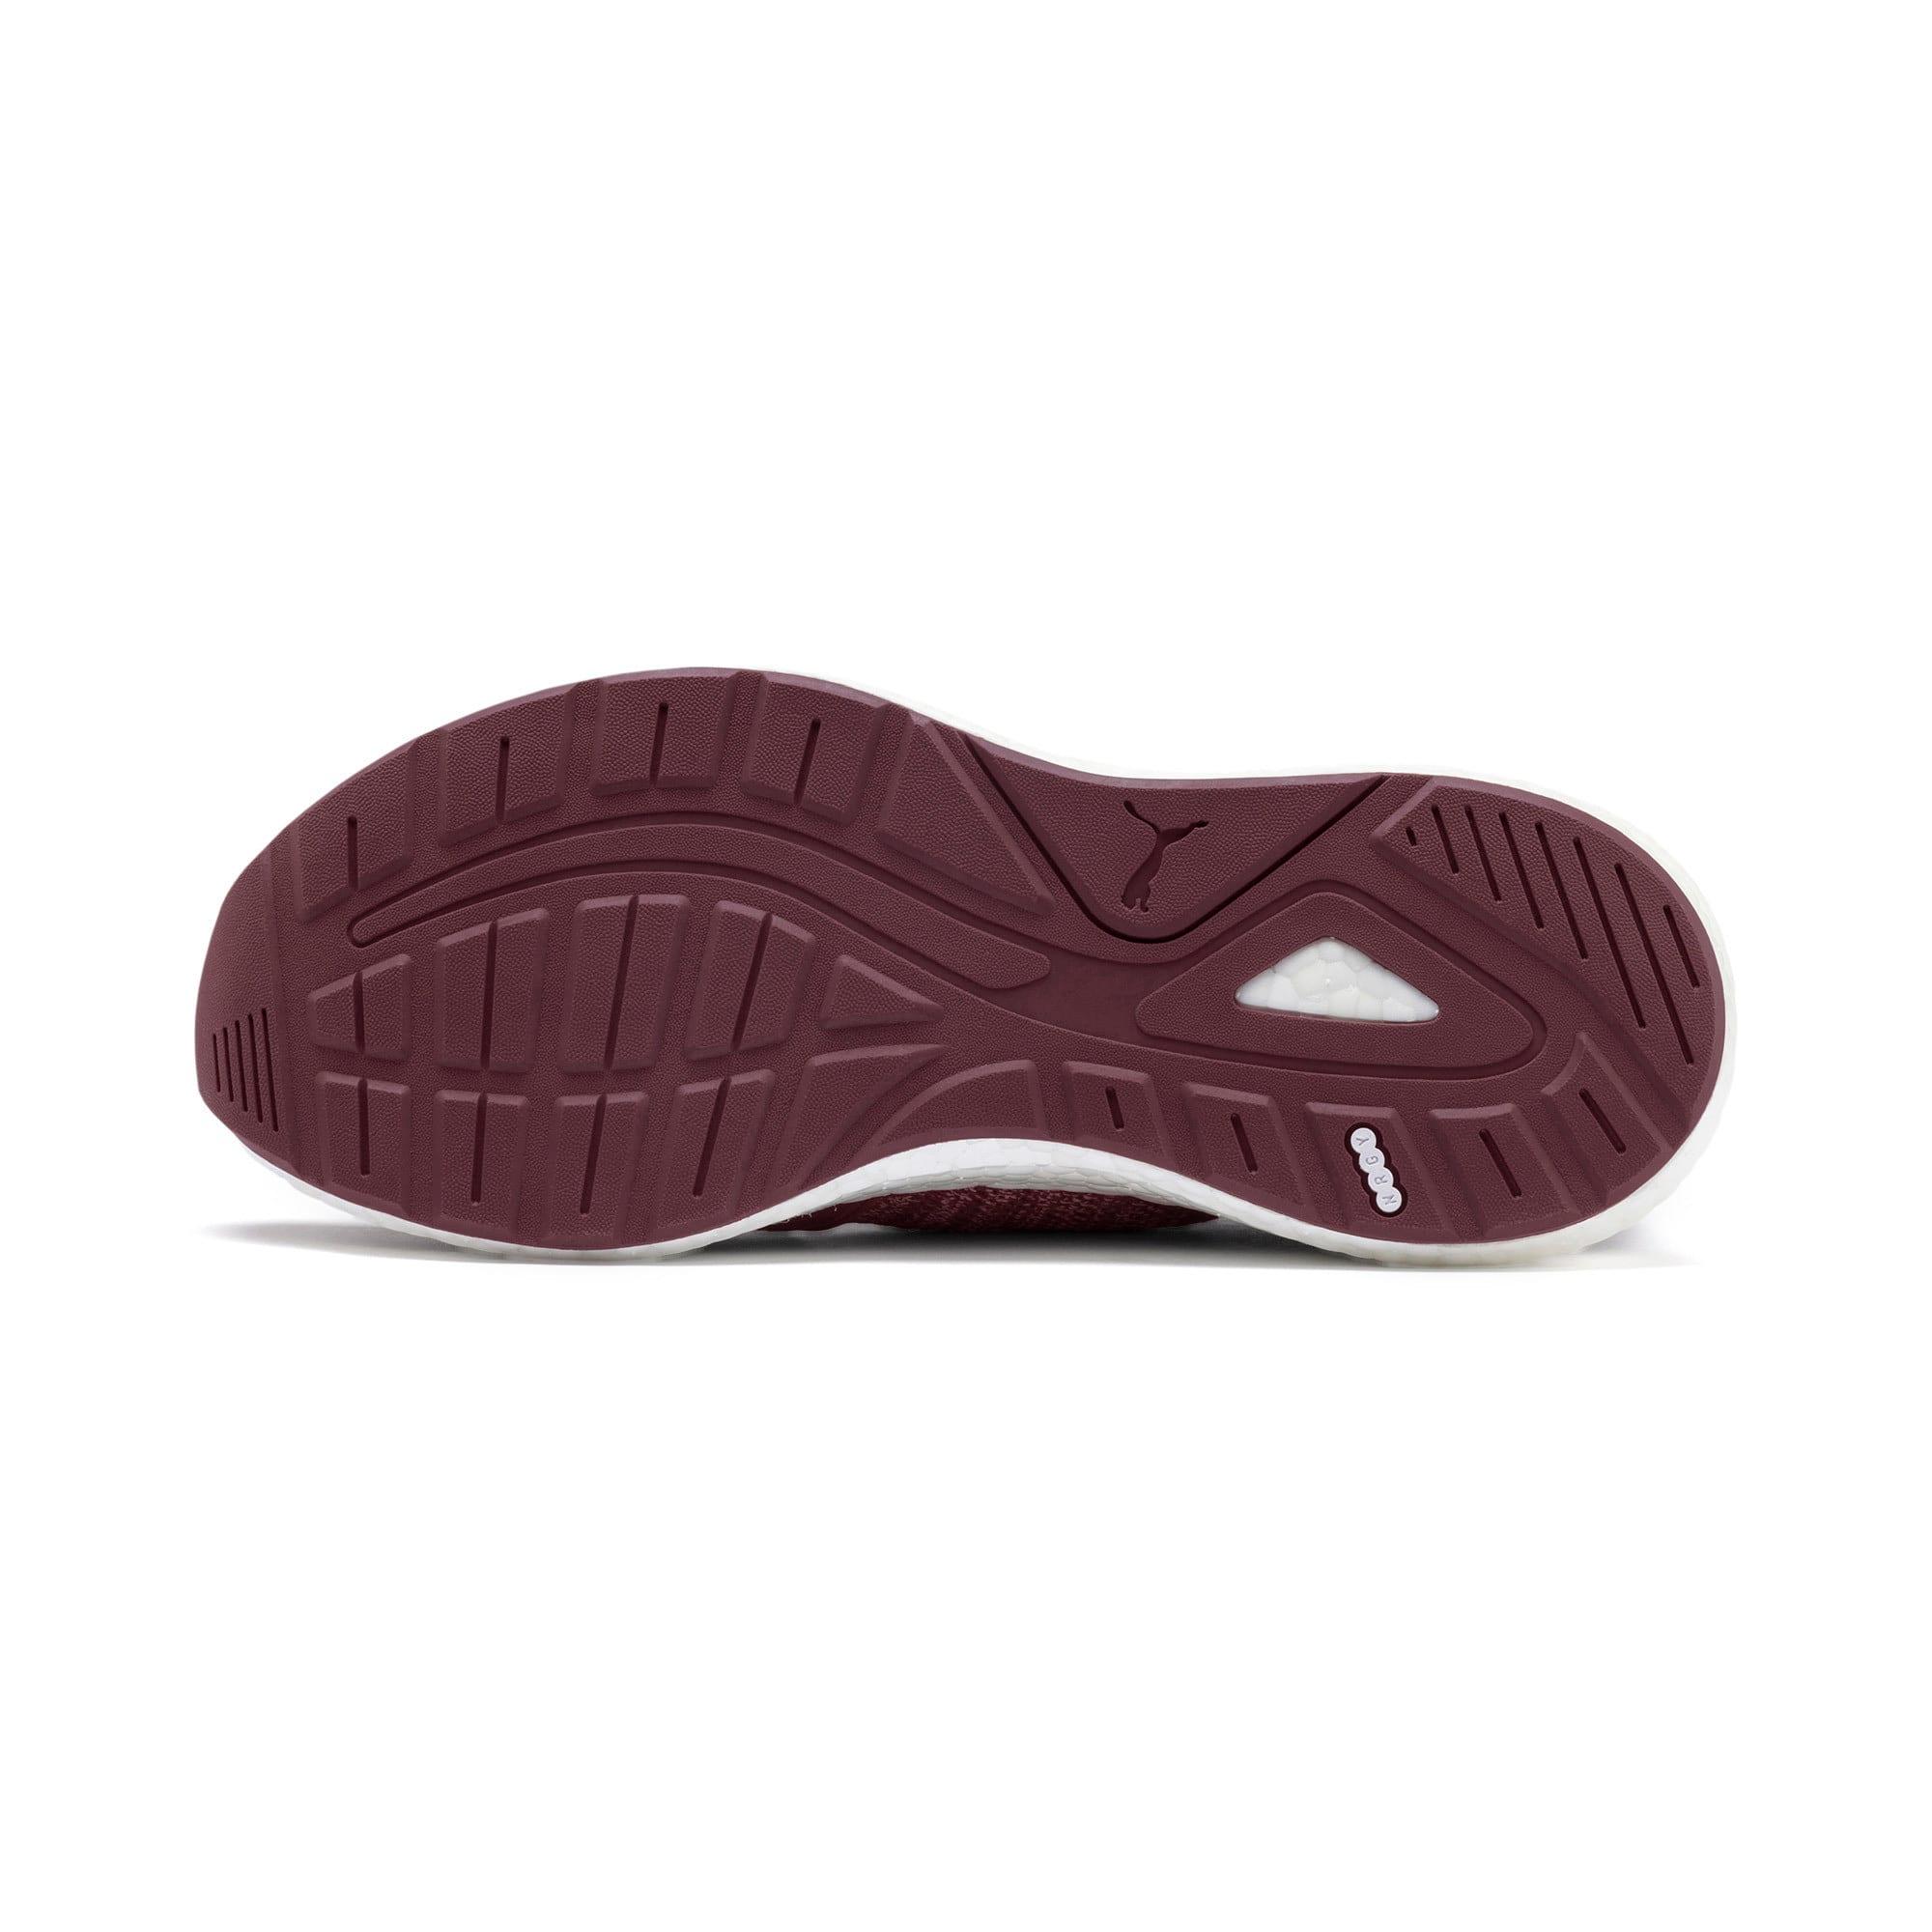 Thumbnail 5 of NRGY Neko Engineer Knit Women's Running Shoes, Vineyard Wine-Rose-White, medium